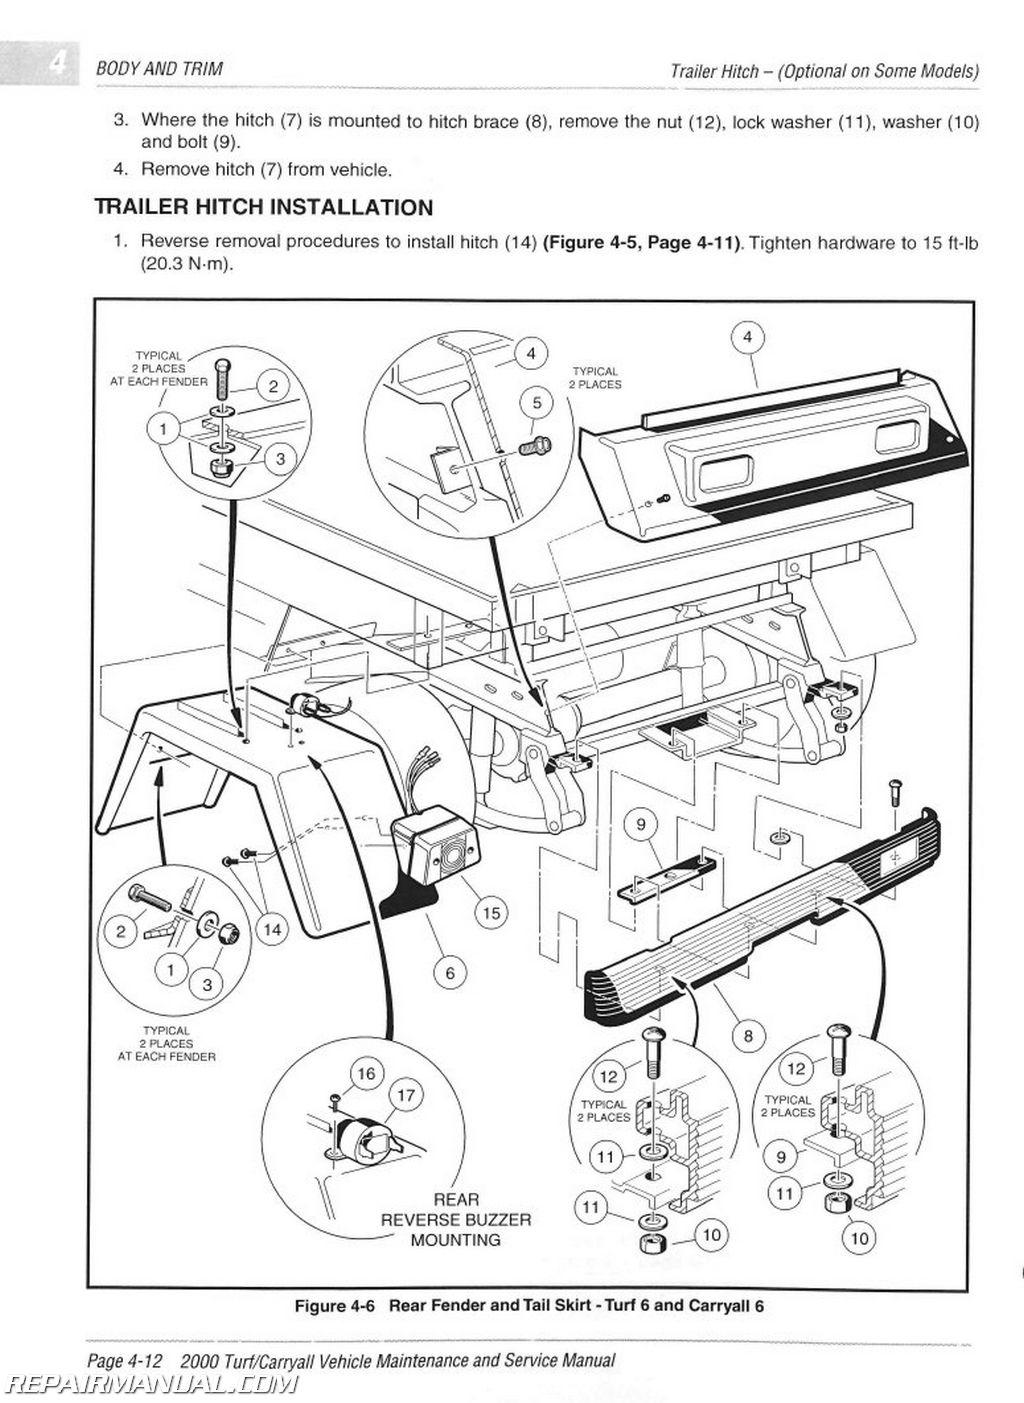 Carry All 2 Wiring Diagram - Carbonvote.mudit.blog • on